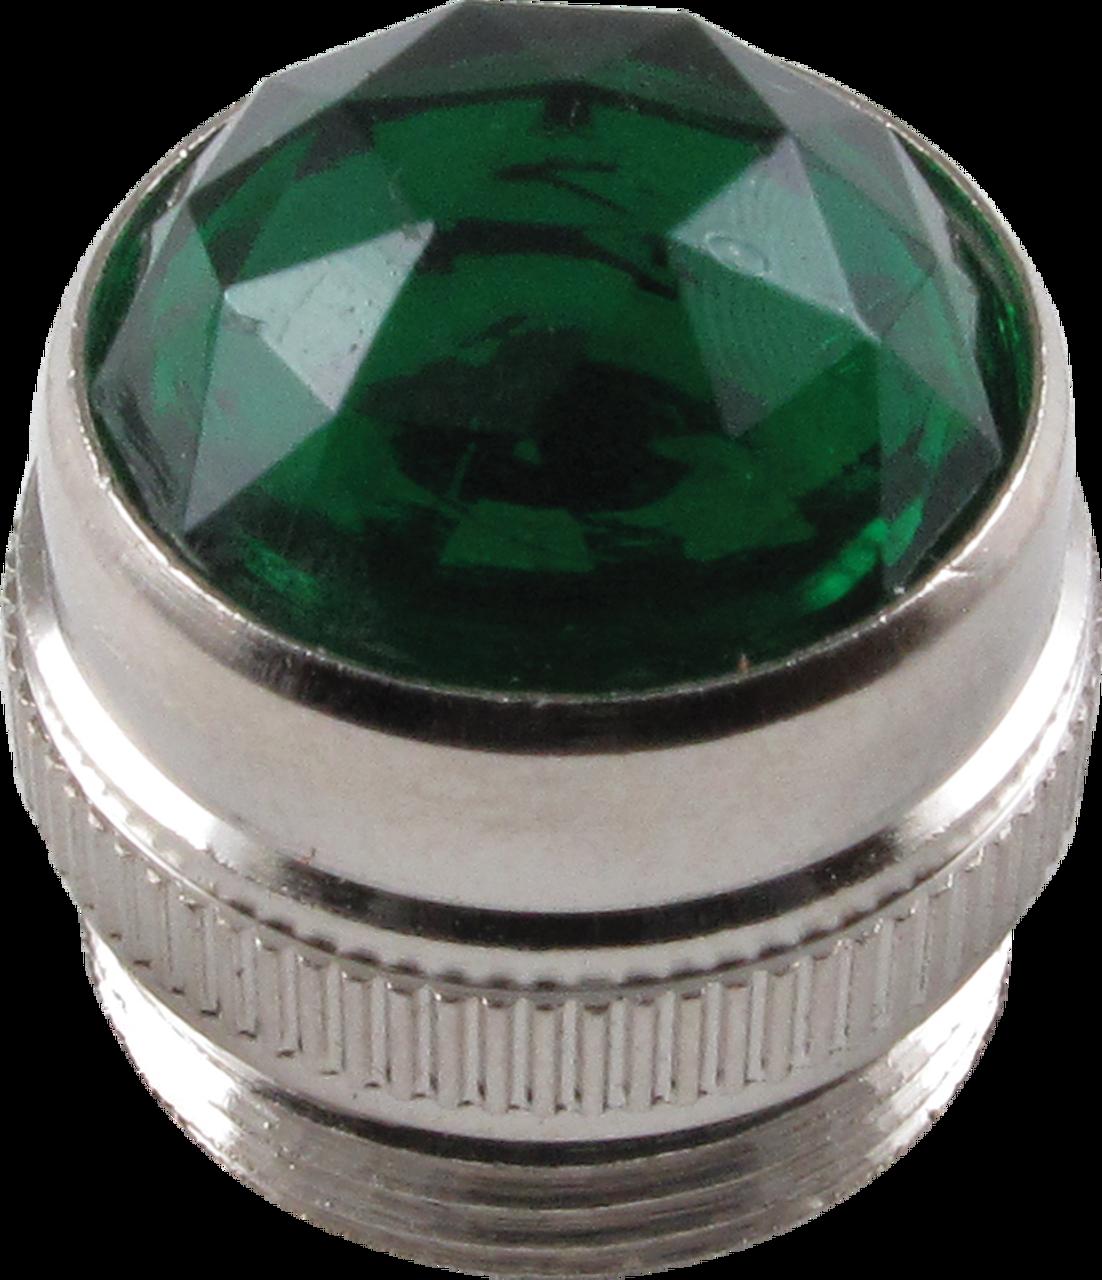 Amp Jewel - Fender Style Green